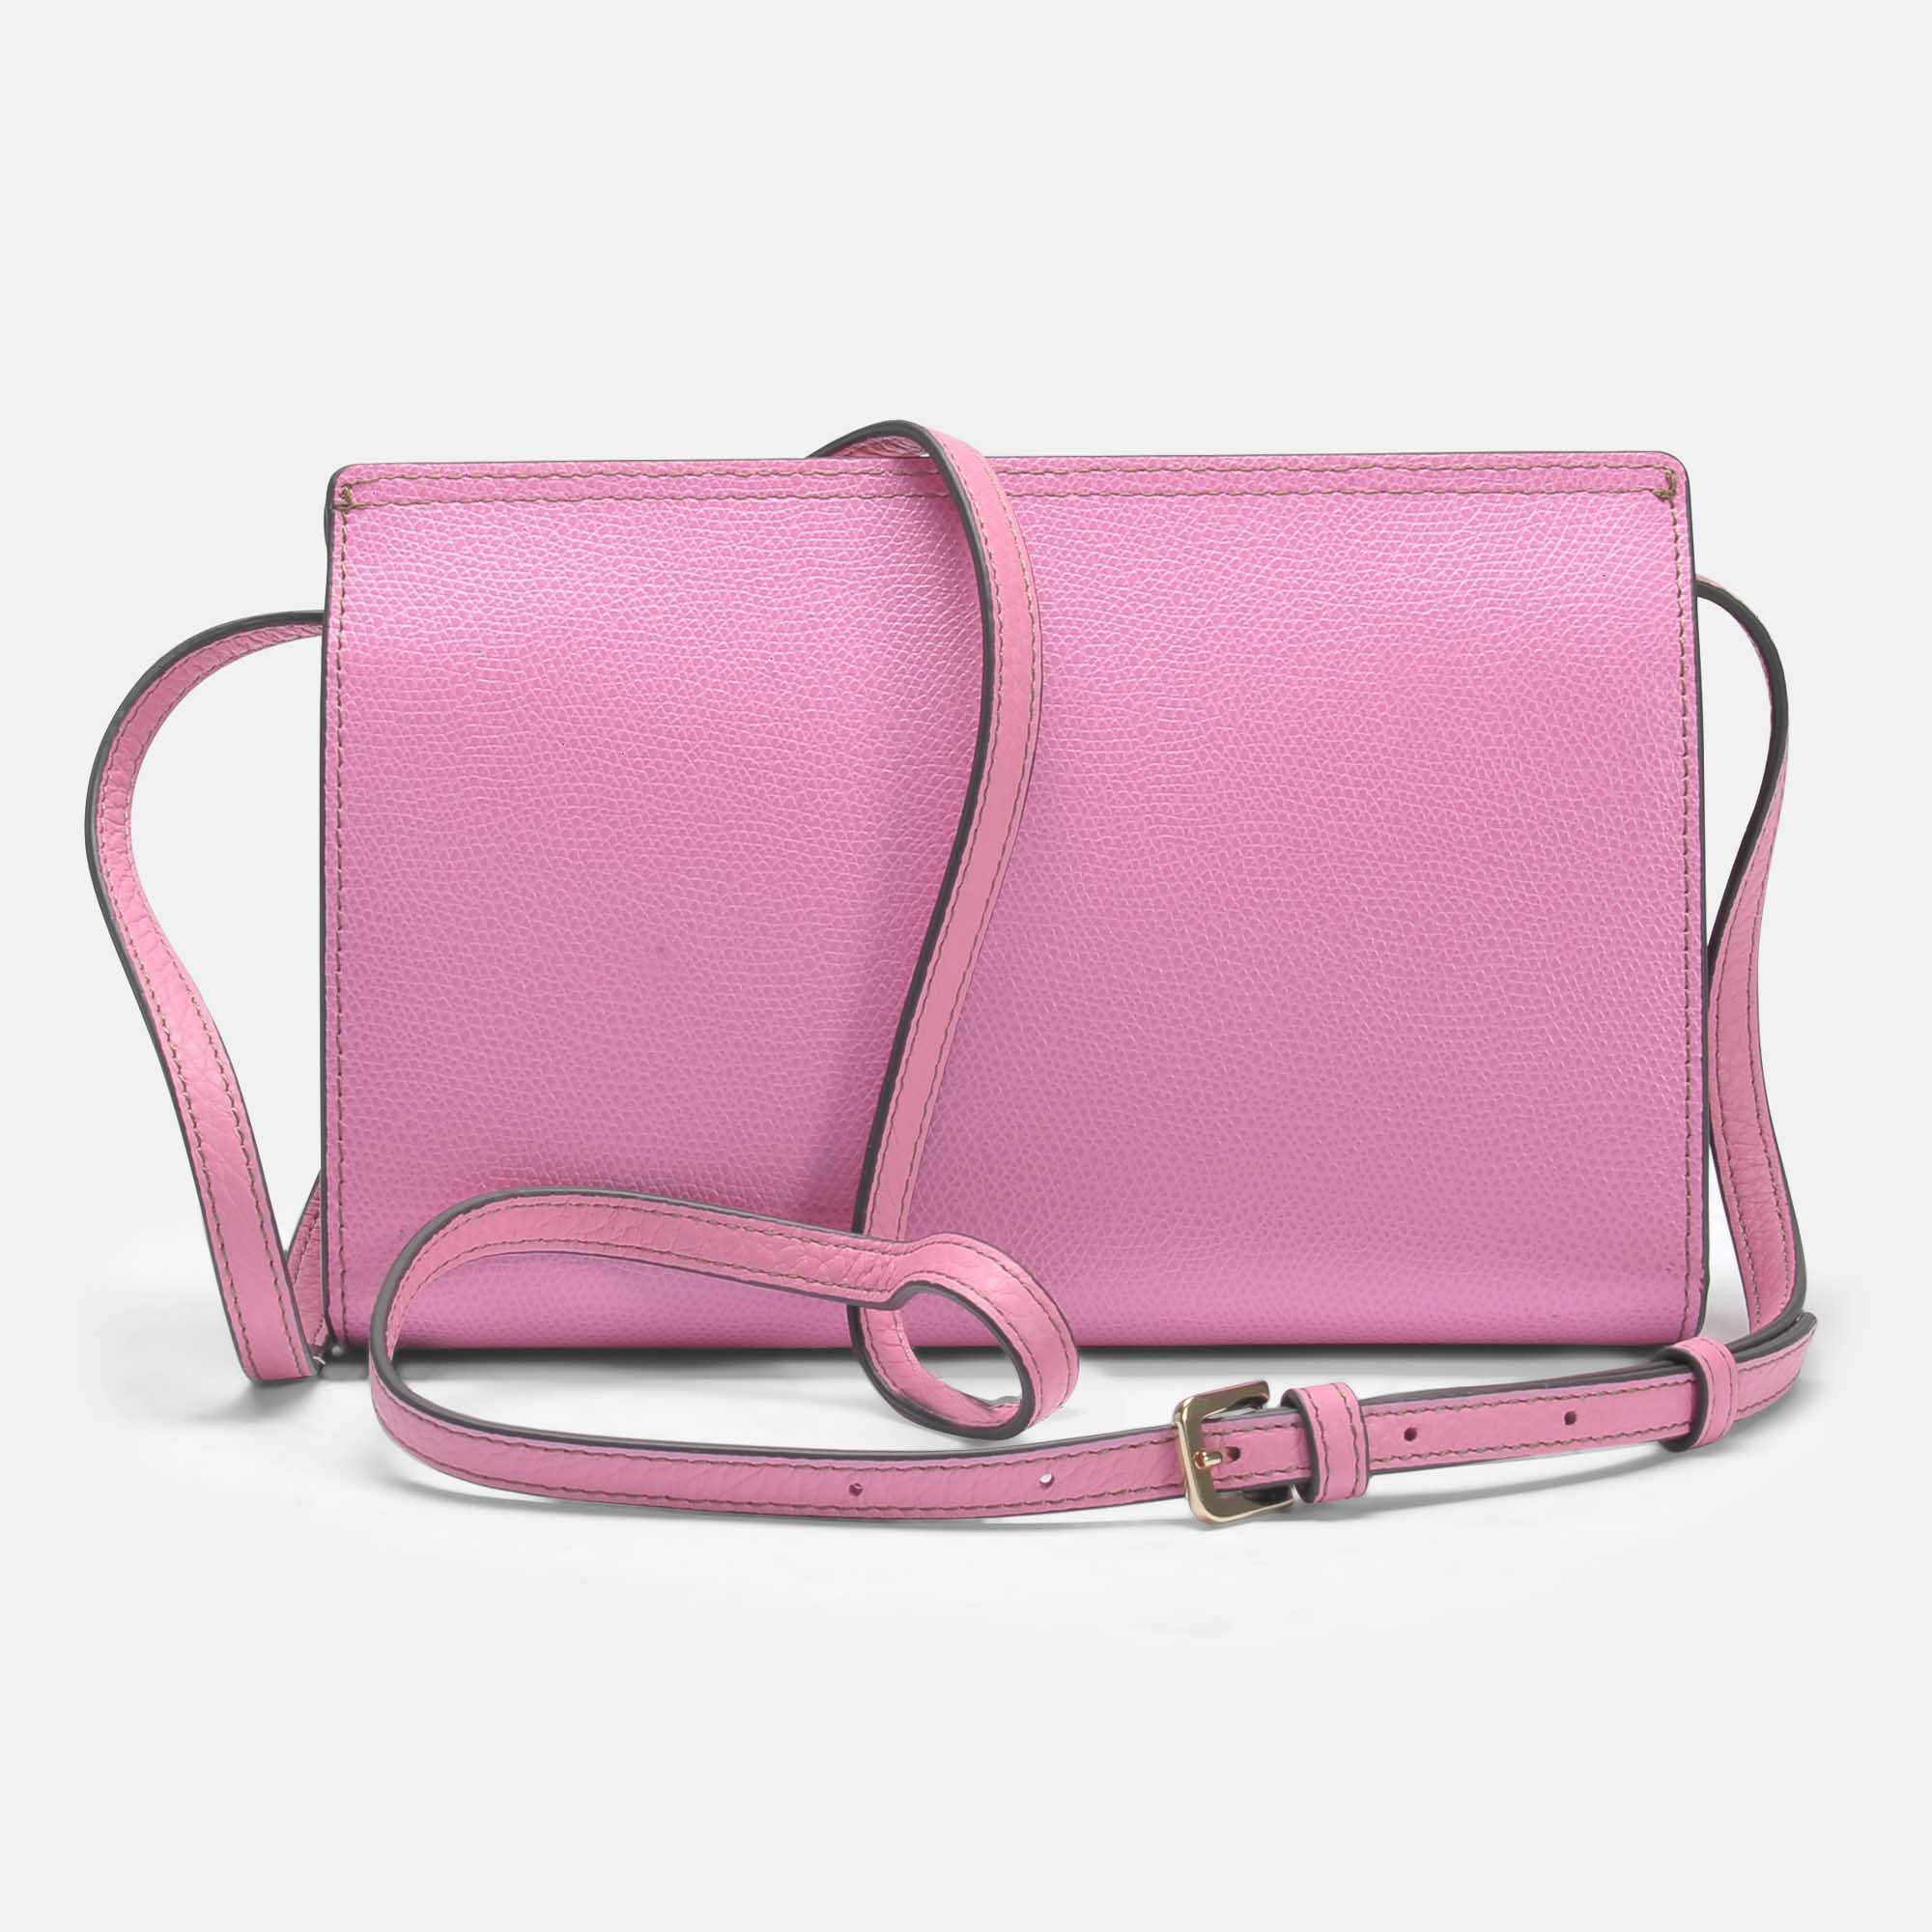 Like Mini Crossbody Tasche in Orchid aus Ares Leder Furla 28cJ3e